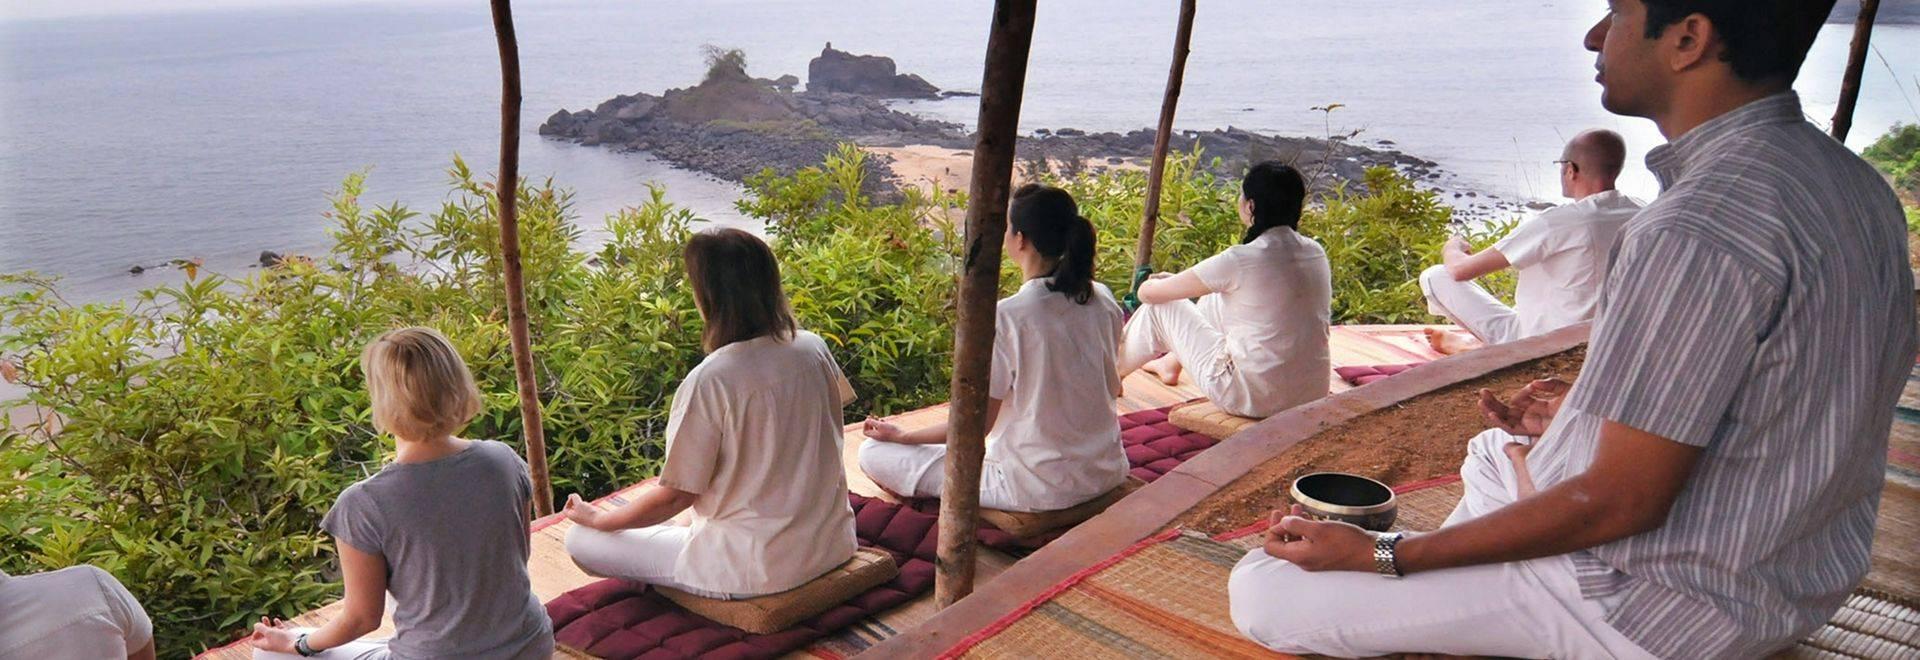 SwaSwara-meditate.jpg